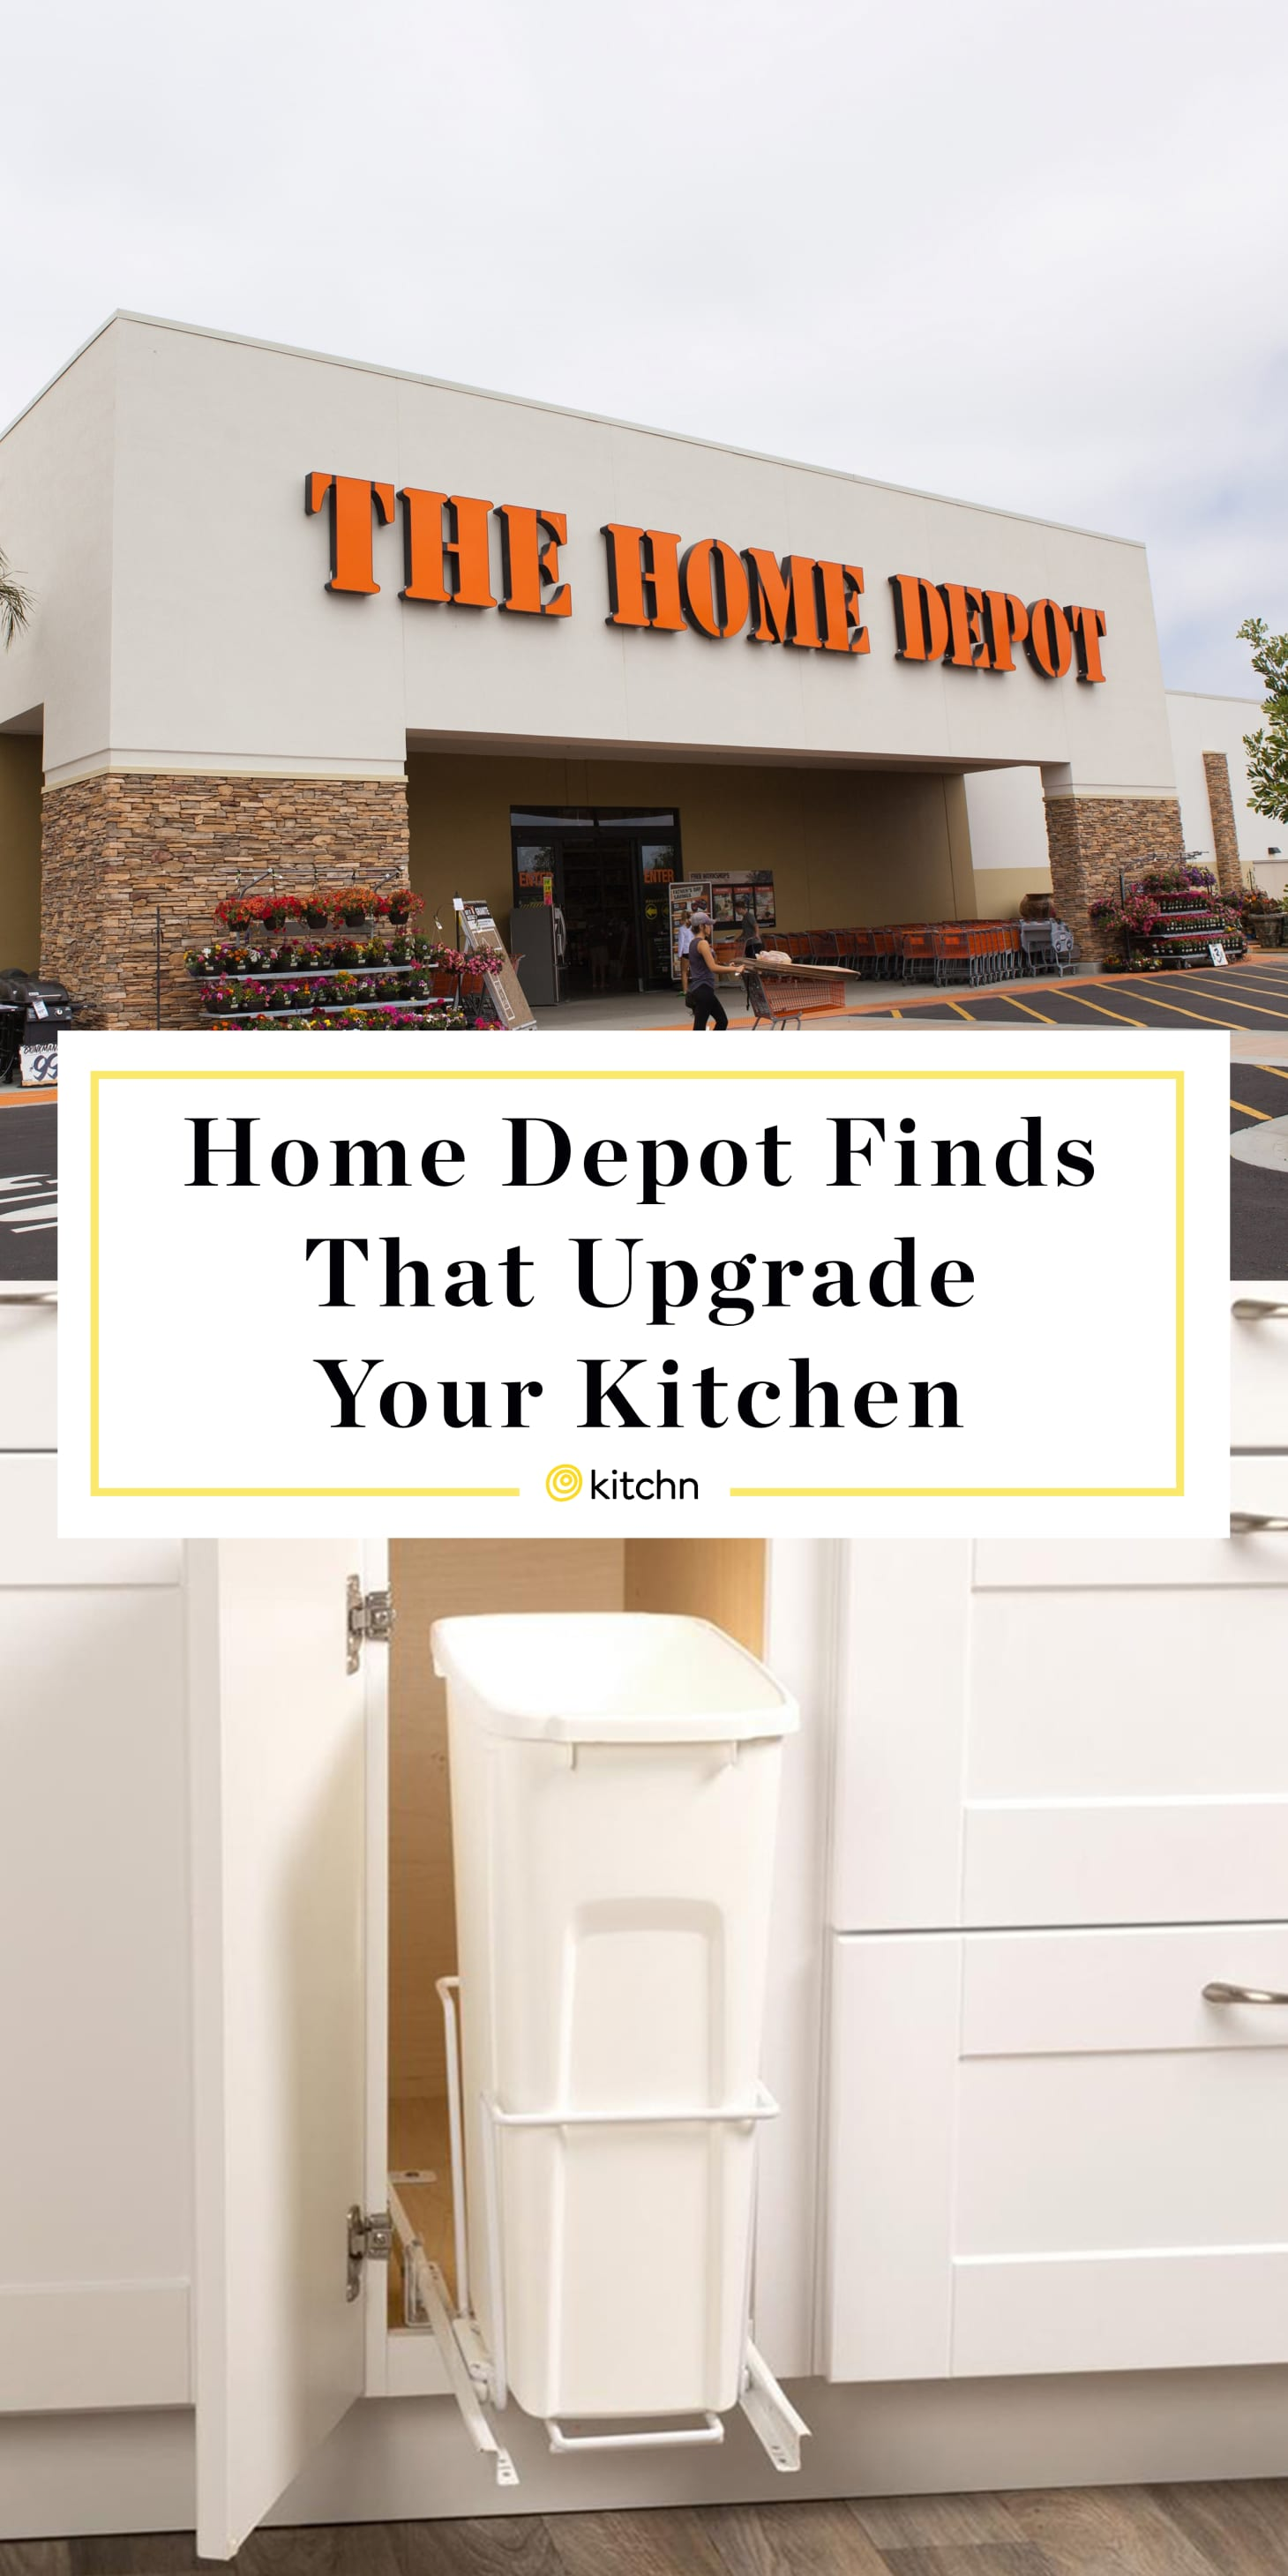 Home Depot Easy Diy Kits Kitchn